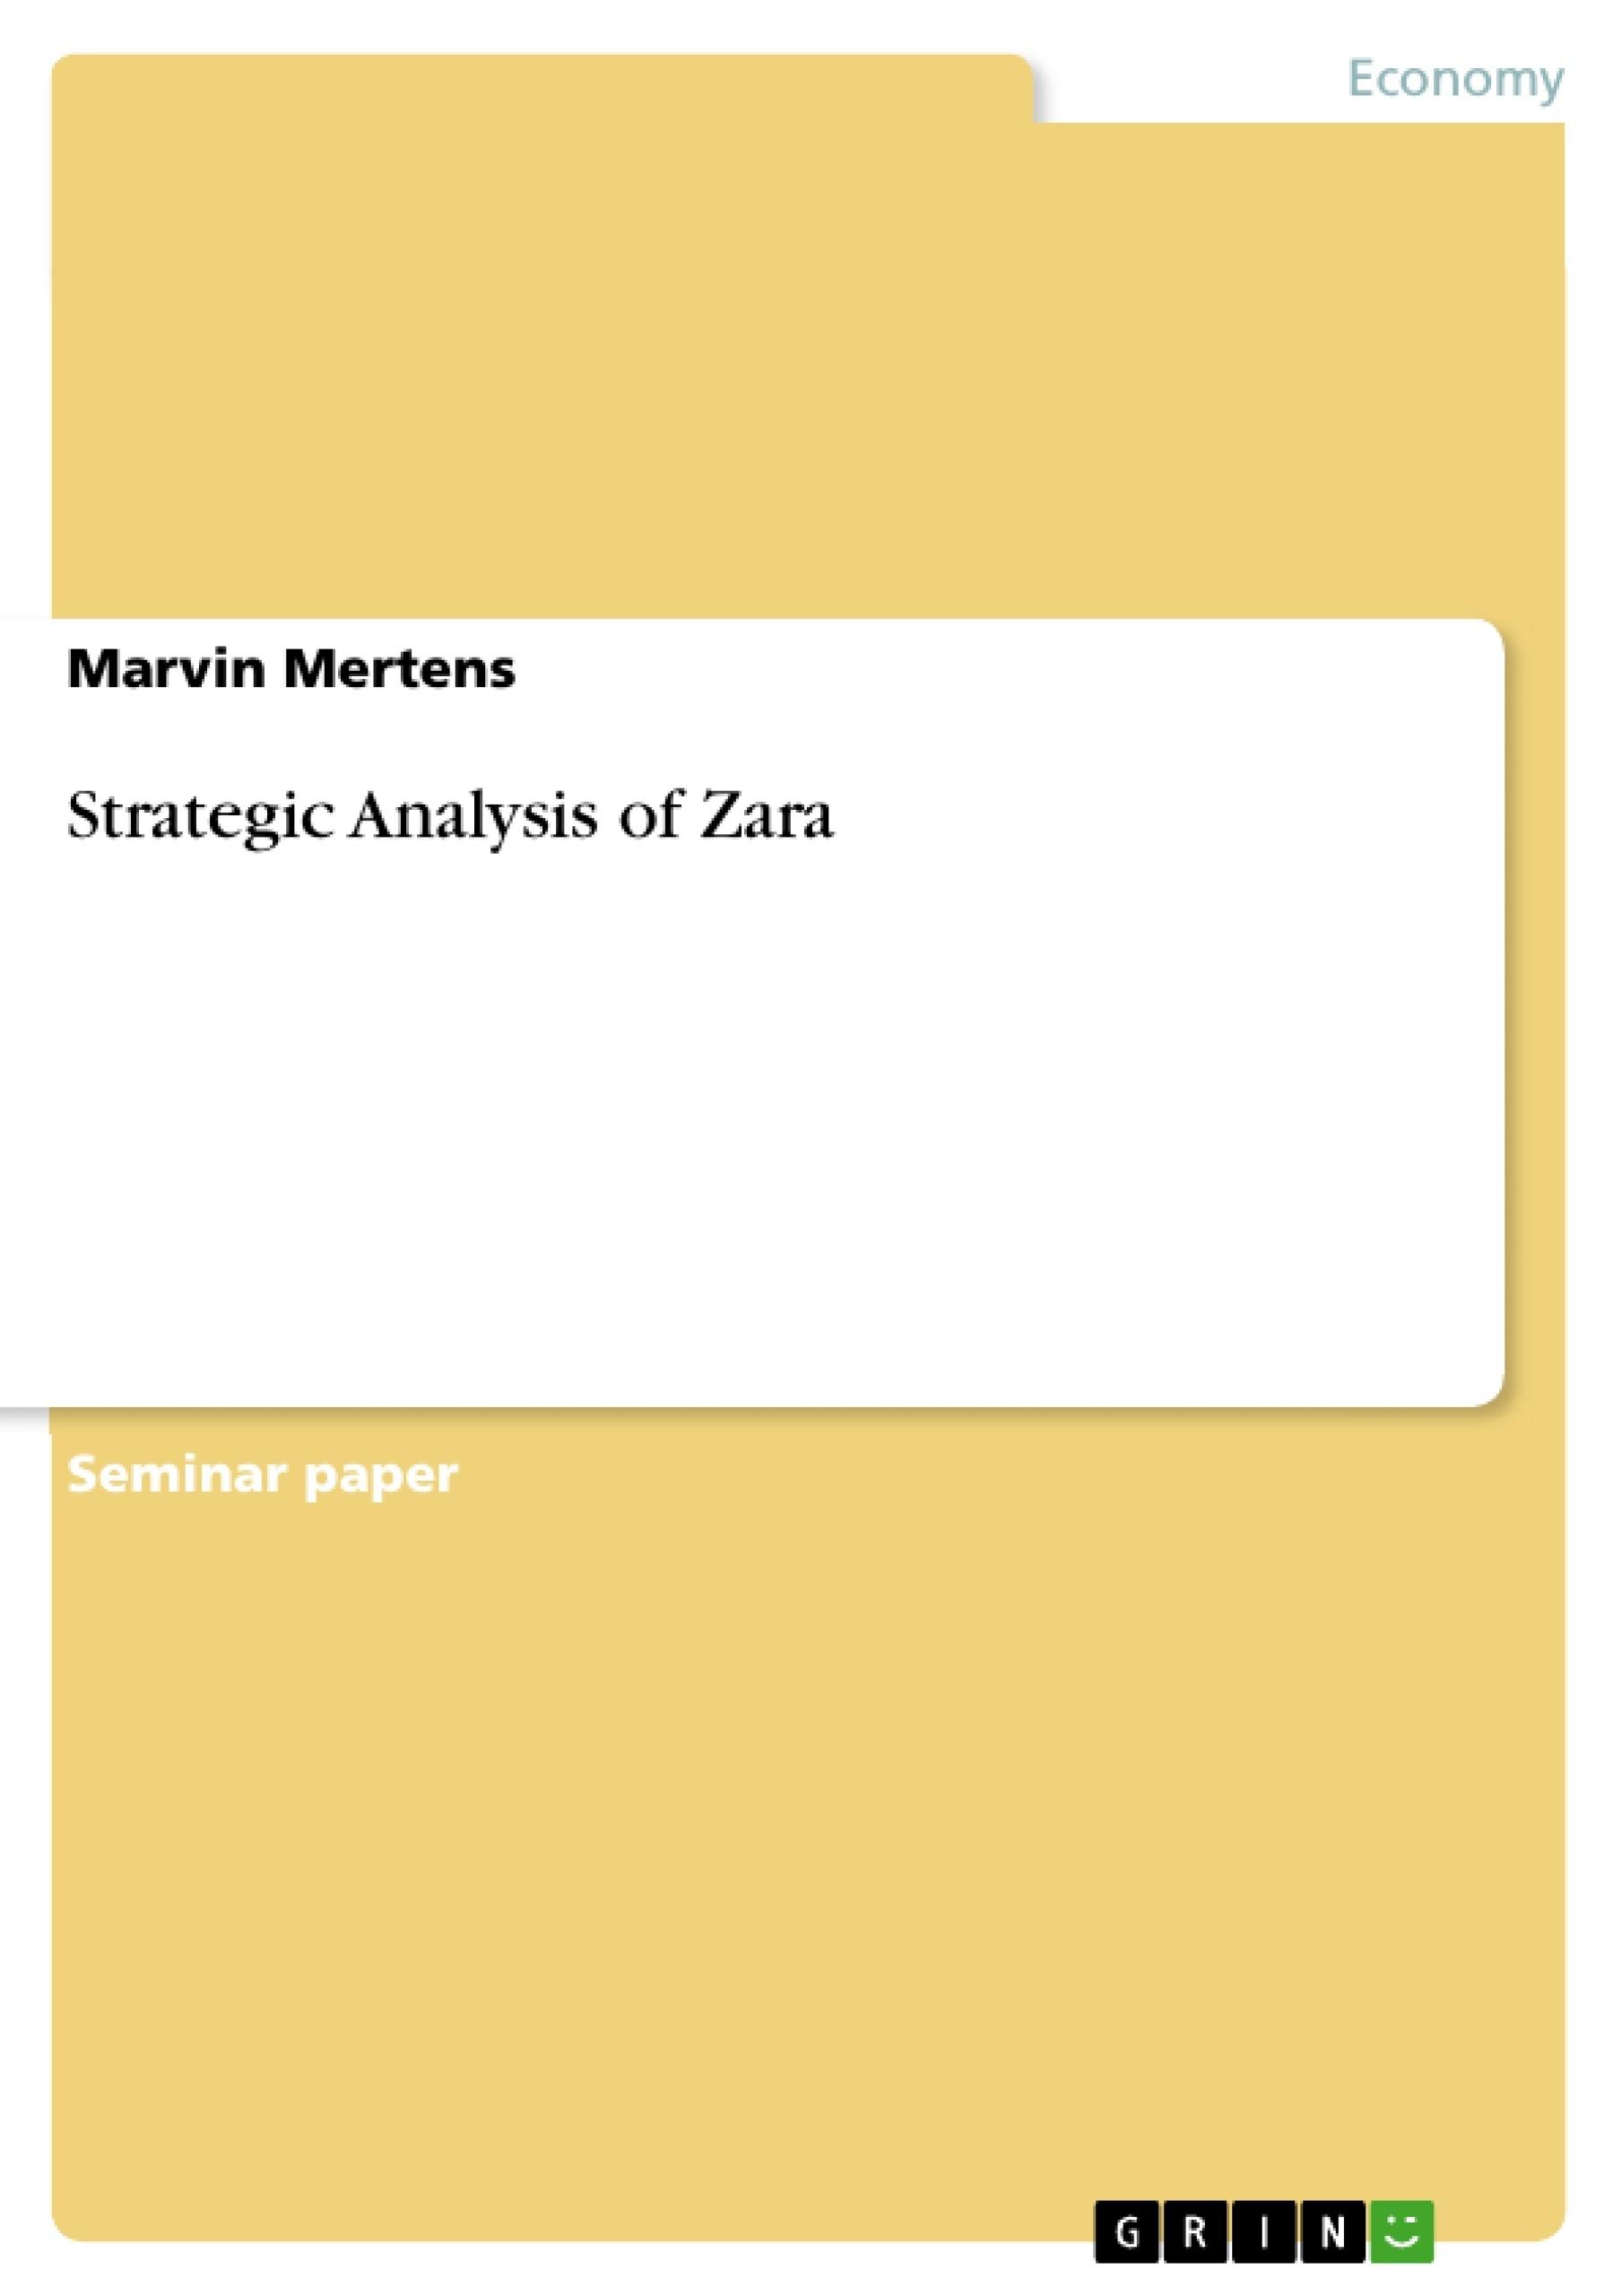 Title: Strategic Analysis of Zara